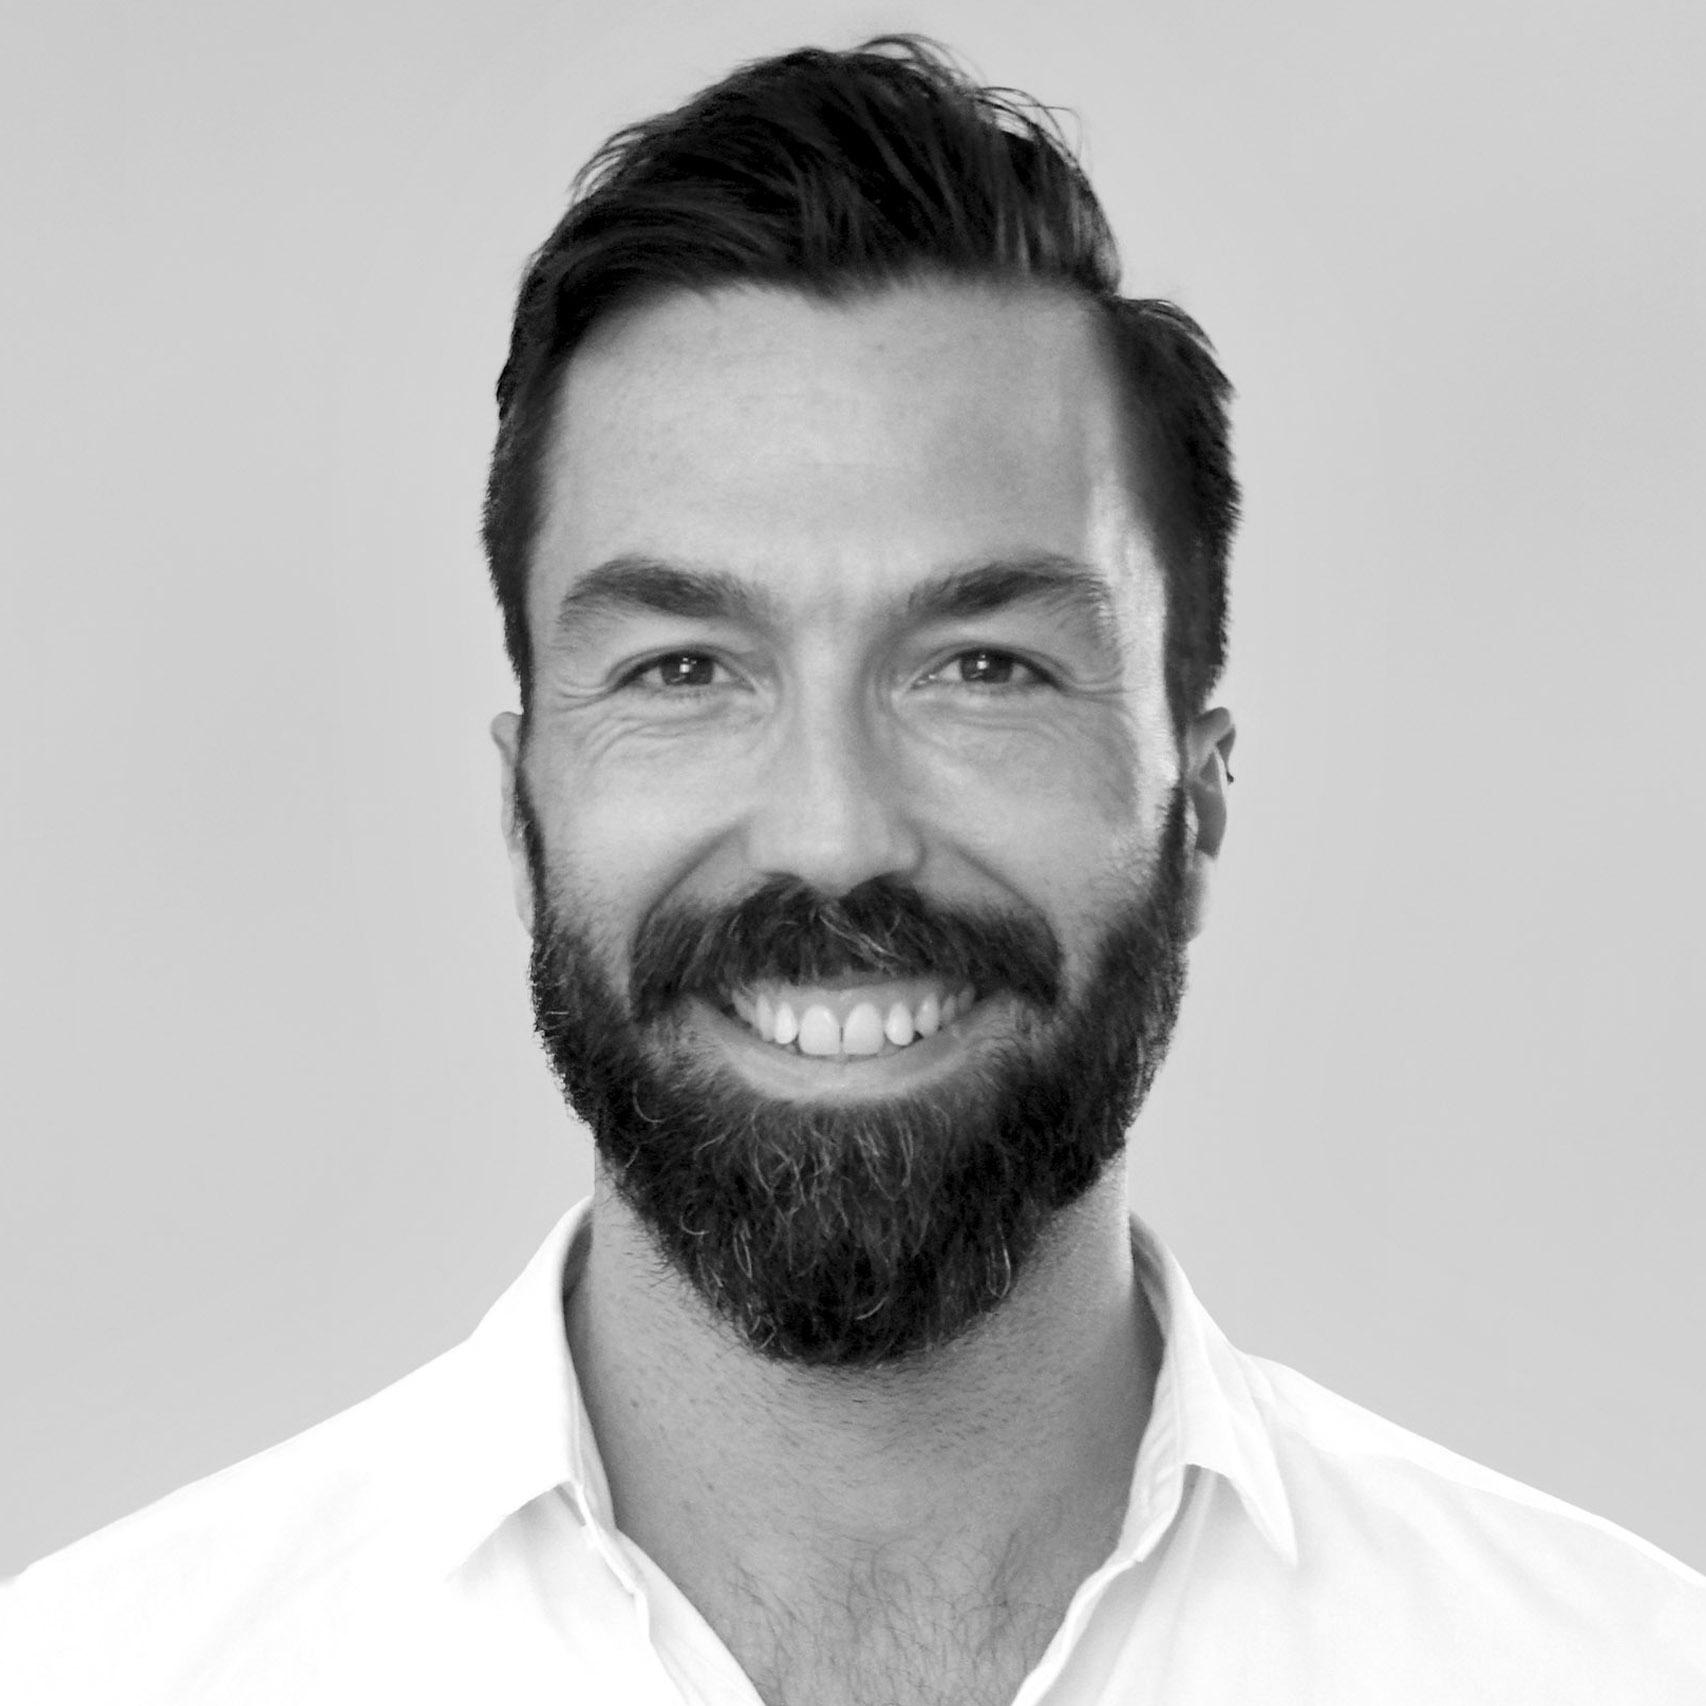 https://ksrarchitects.com/wp-content/uploads/2020/12/Ruben-Iglesias.jpg